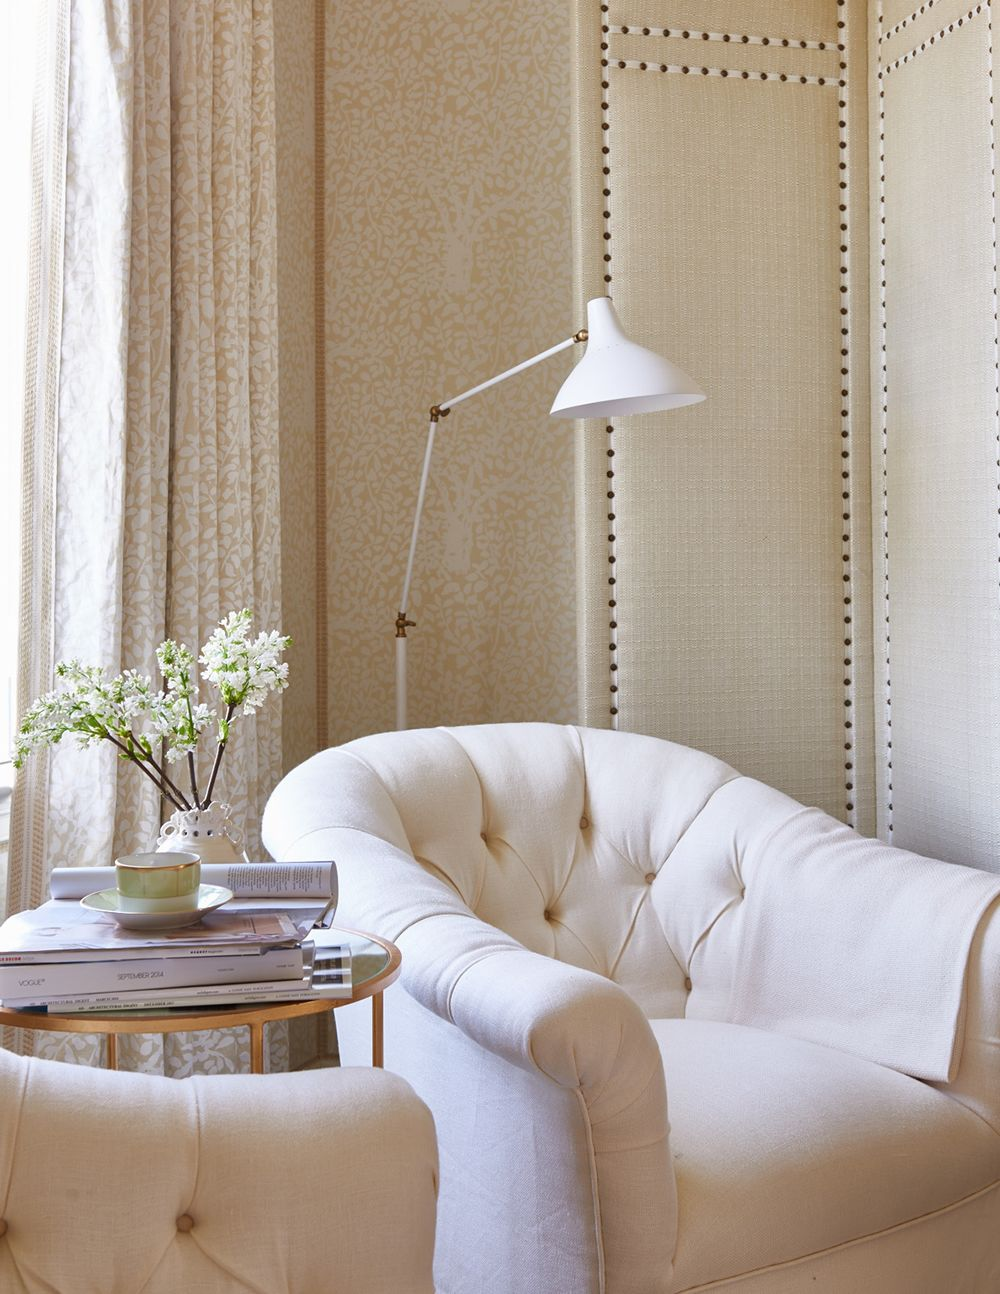 China seas arbre de matisse wallpaper interior design by mark d sikes